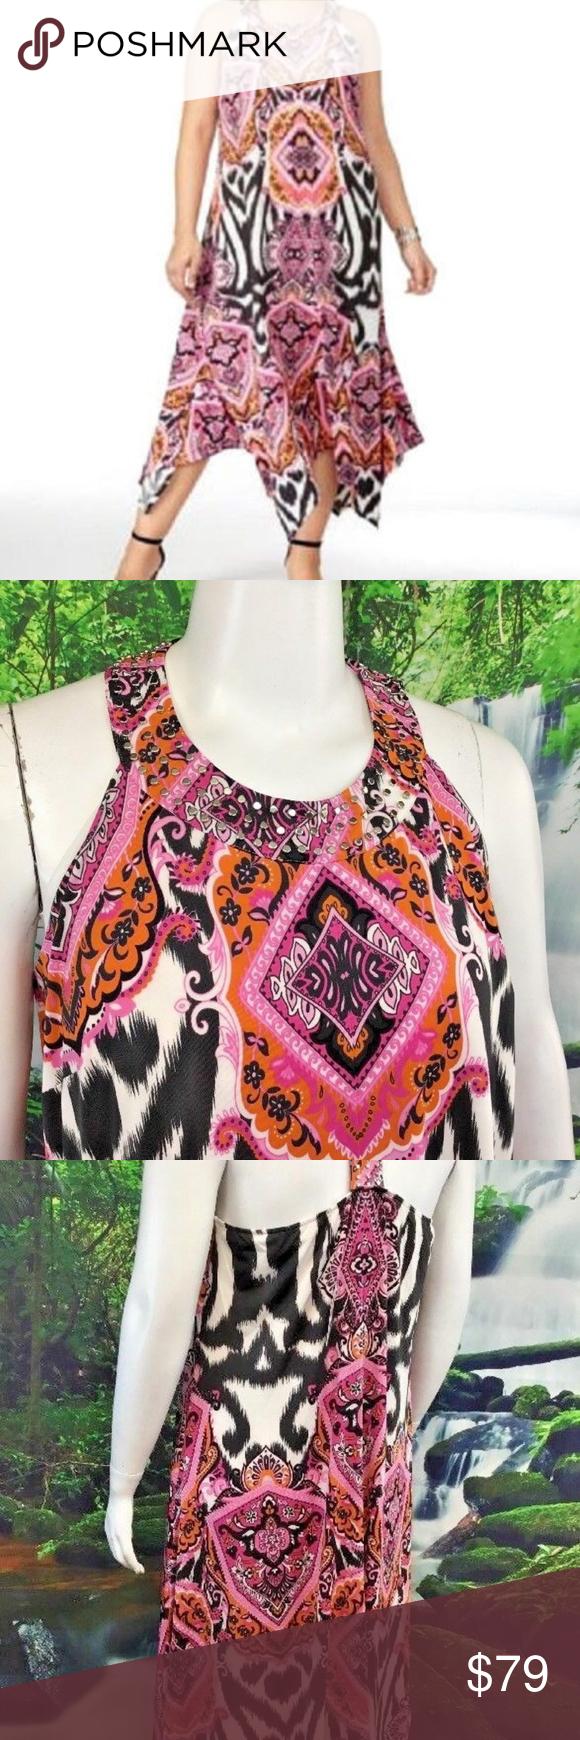 Inc International Racerback Hankerchief Dress 2x Price Break Stunning Spring And Summer Dress By Inc International Fashion Hankerchief Dress Clothes Design [ 1740 x 580 Pixel ]